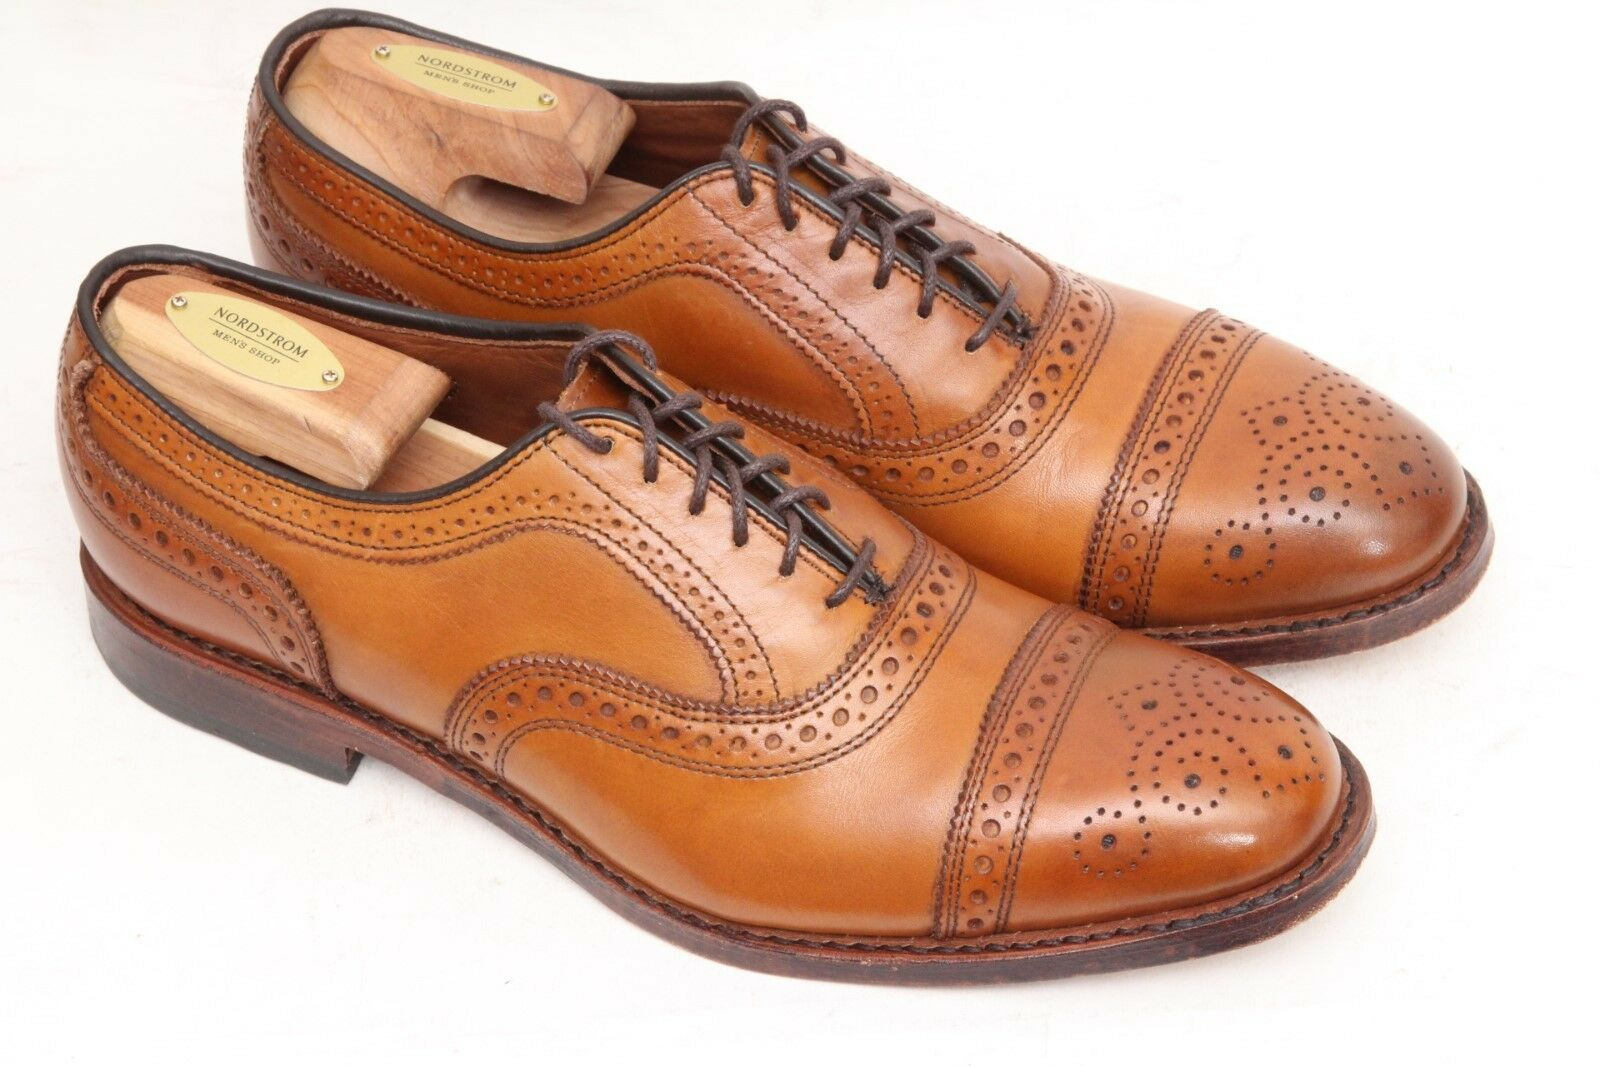 Allen Edmonds Strand Cap-Toe Oxford Brown Walnut 1635 Size 7.5 D